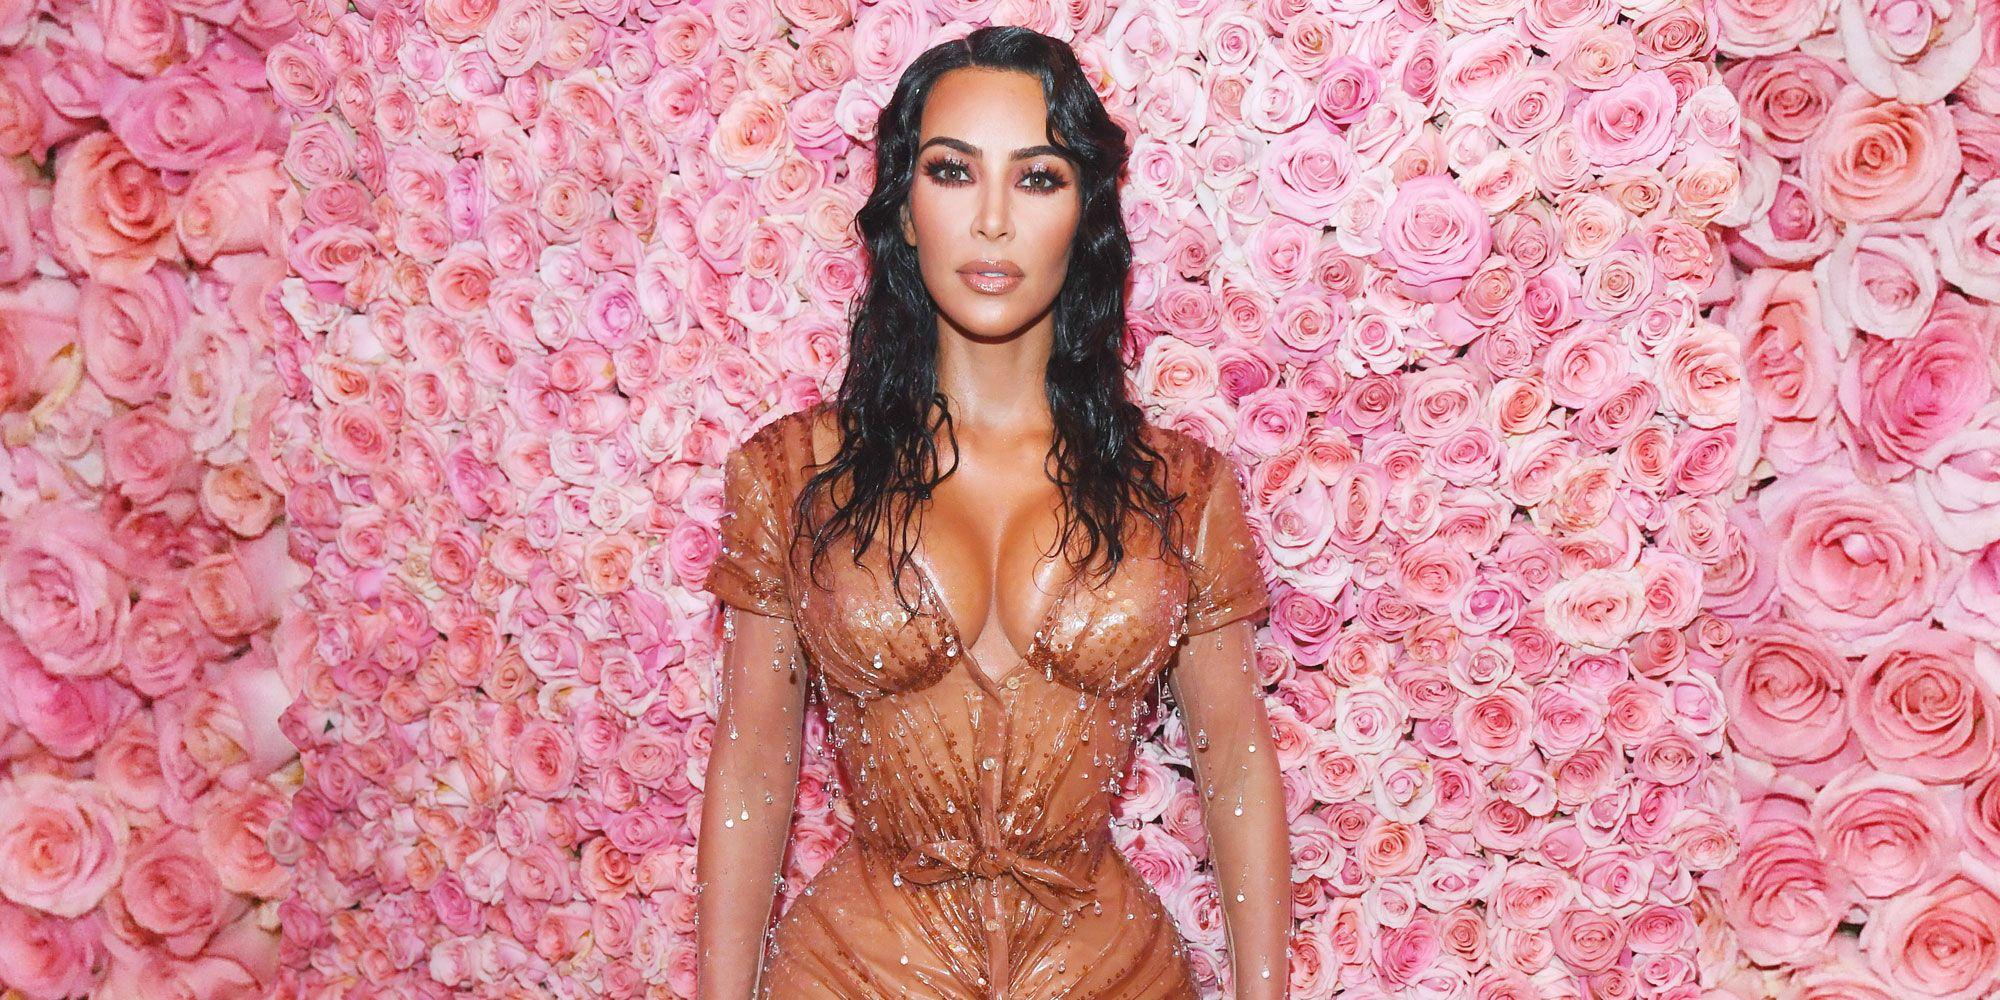 How Kim Kardashian's 2019 Met Gala corset whittled her waist